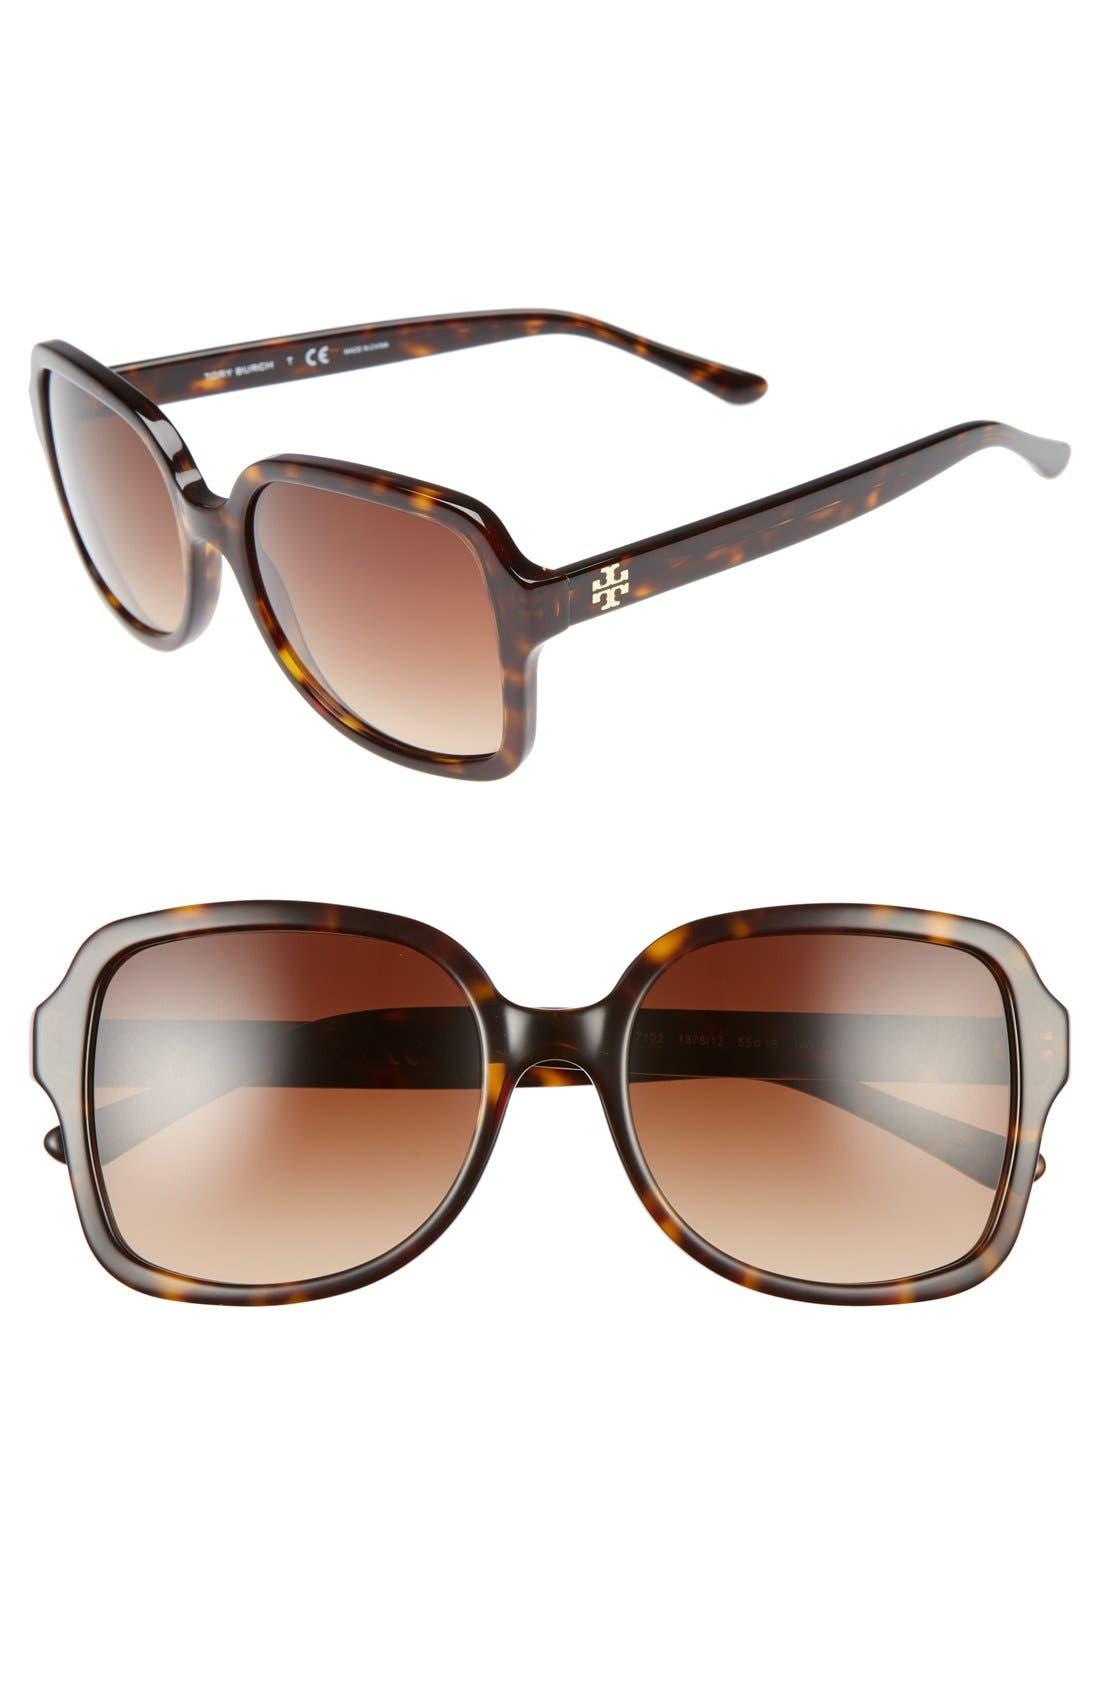 55mm Square Sunglasses,                             Main thumbnail 1, color,                             DARK TORTOISE